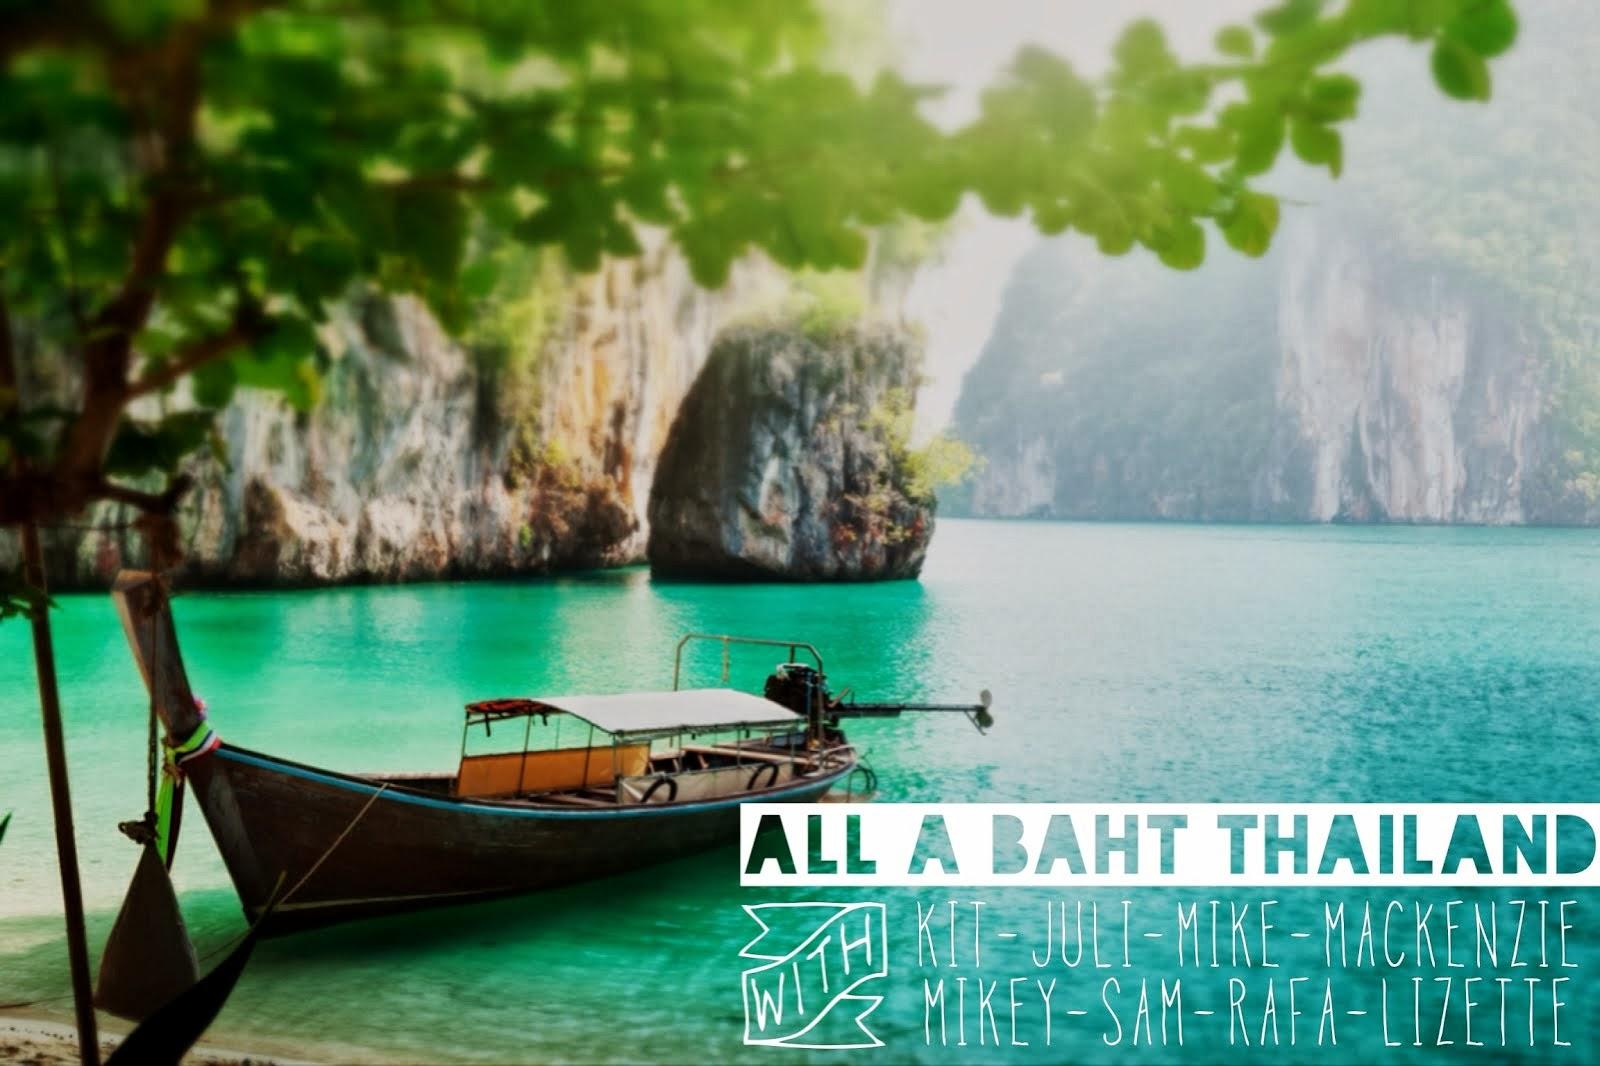 All A-Baht Thailand